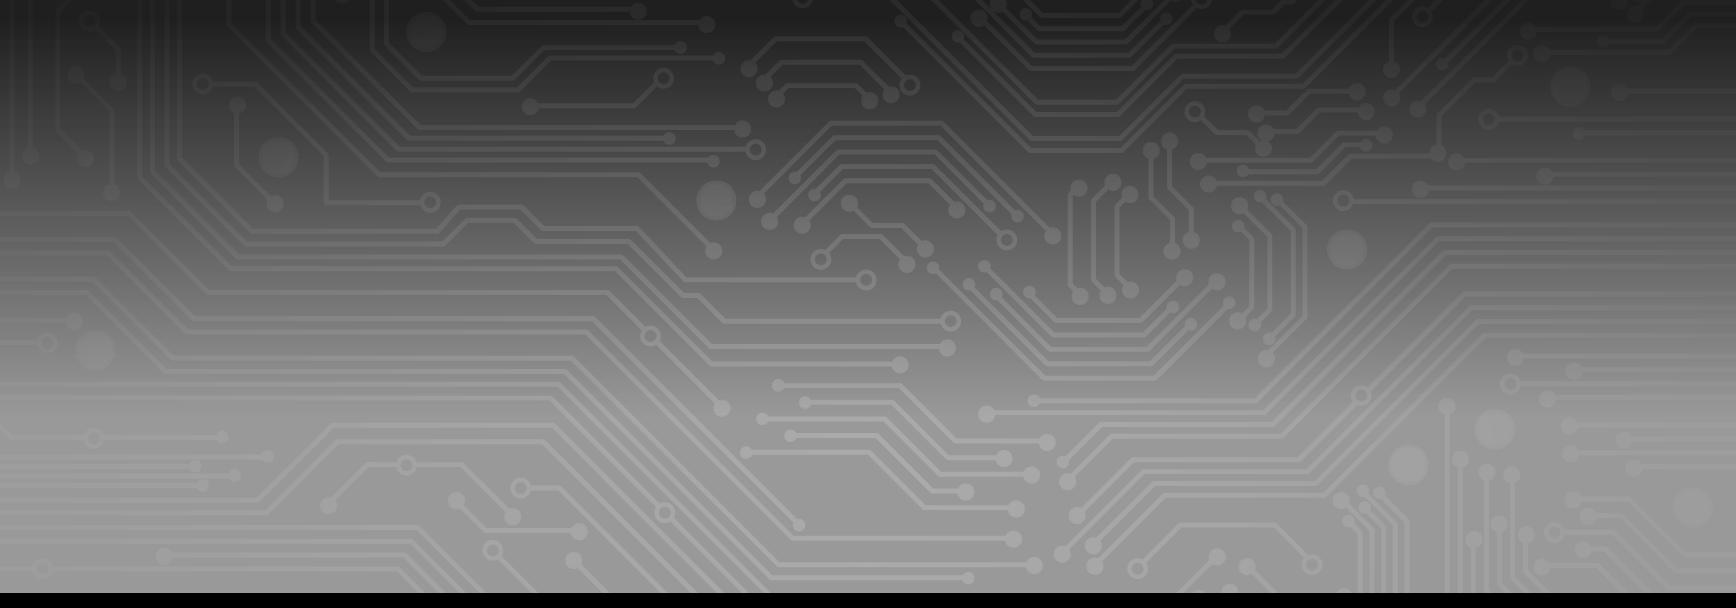 Https Techcrunch Com 2014 03 12 Httpwww Happybirthday Net 2014 03 12t18 21 24z Https Techcrunch Com Wp Content Uploads 2014 03 Celery Man Jpg Celery Man Https Techcrunch Com 2014 03 12 Httpwww Happybirthday Net 2014 03 12t18 25 57z